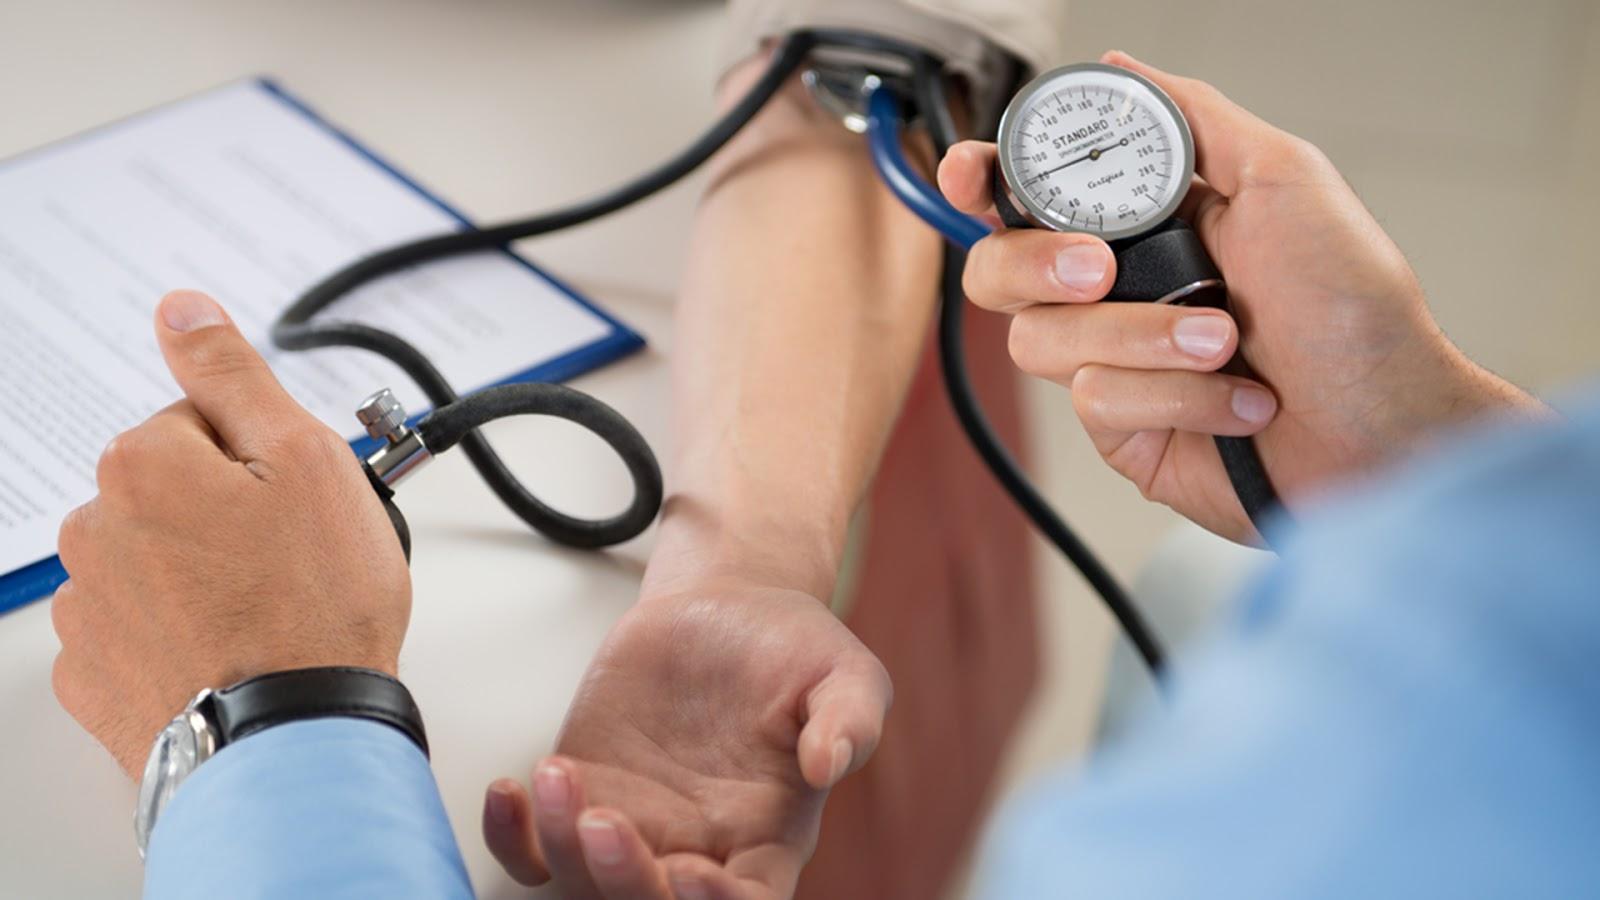 Bacaan Tekanan Darah Tinggi 200 Kini kembali Normal, Badan Pun Cergas